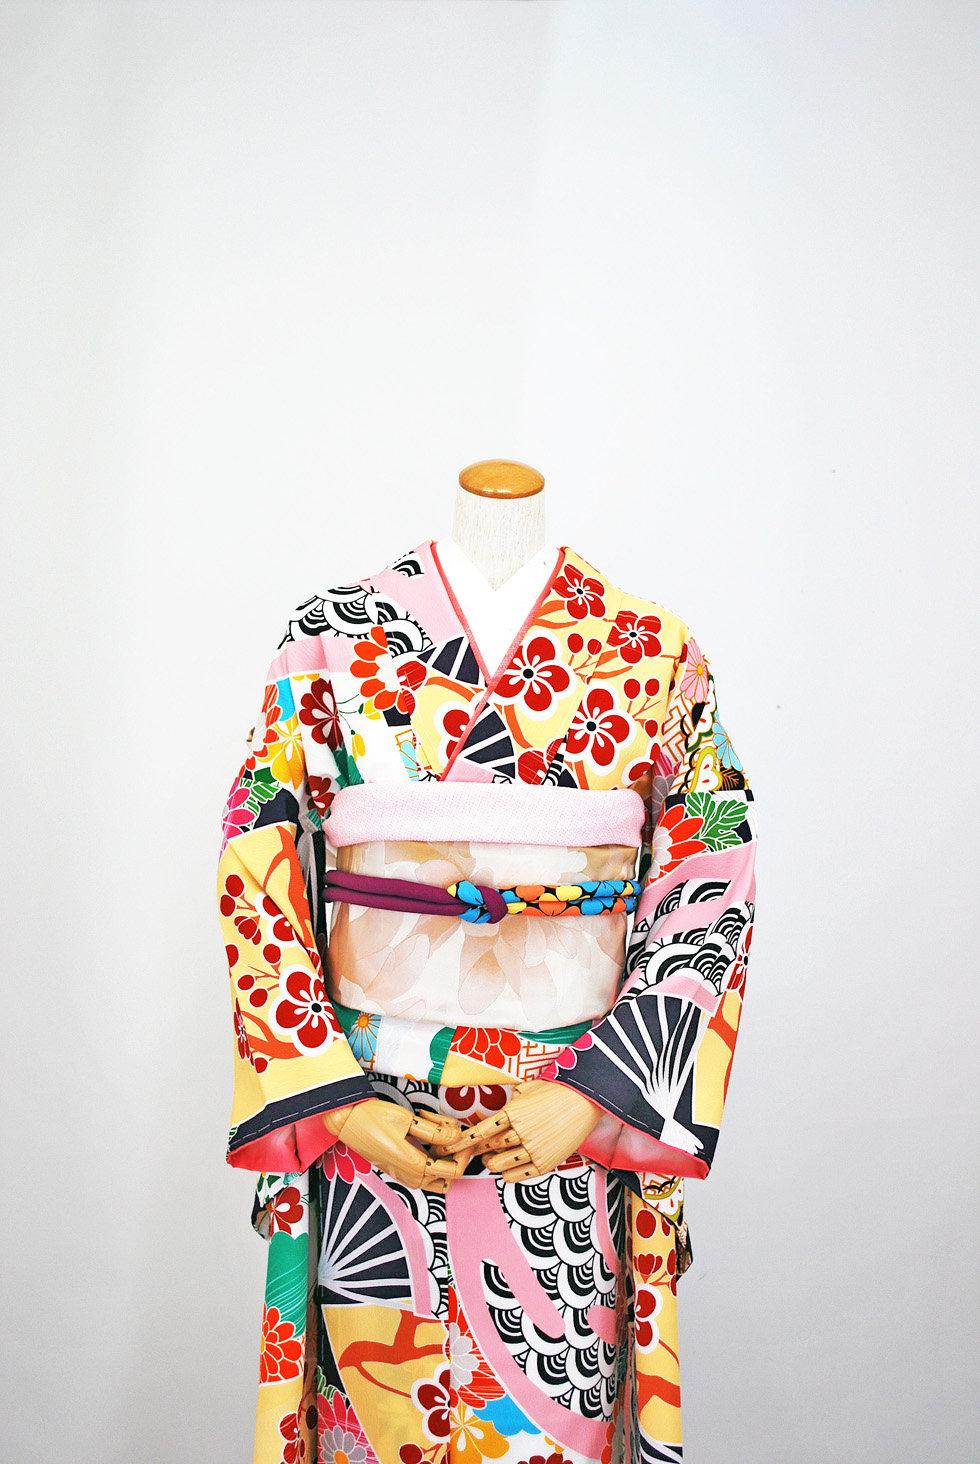 LA-VIE × uresuji | 檜扇 紫地 | 撮影セット